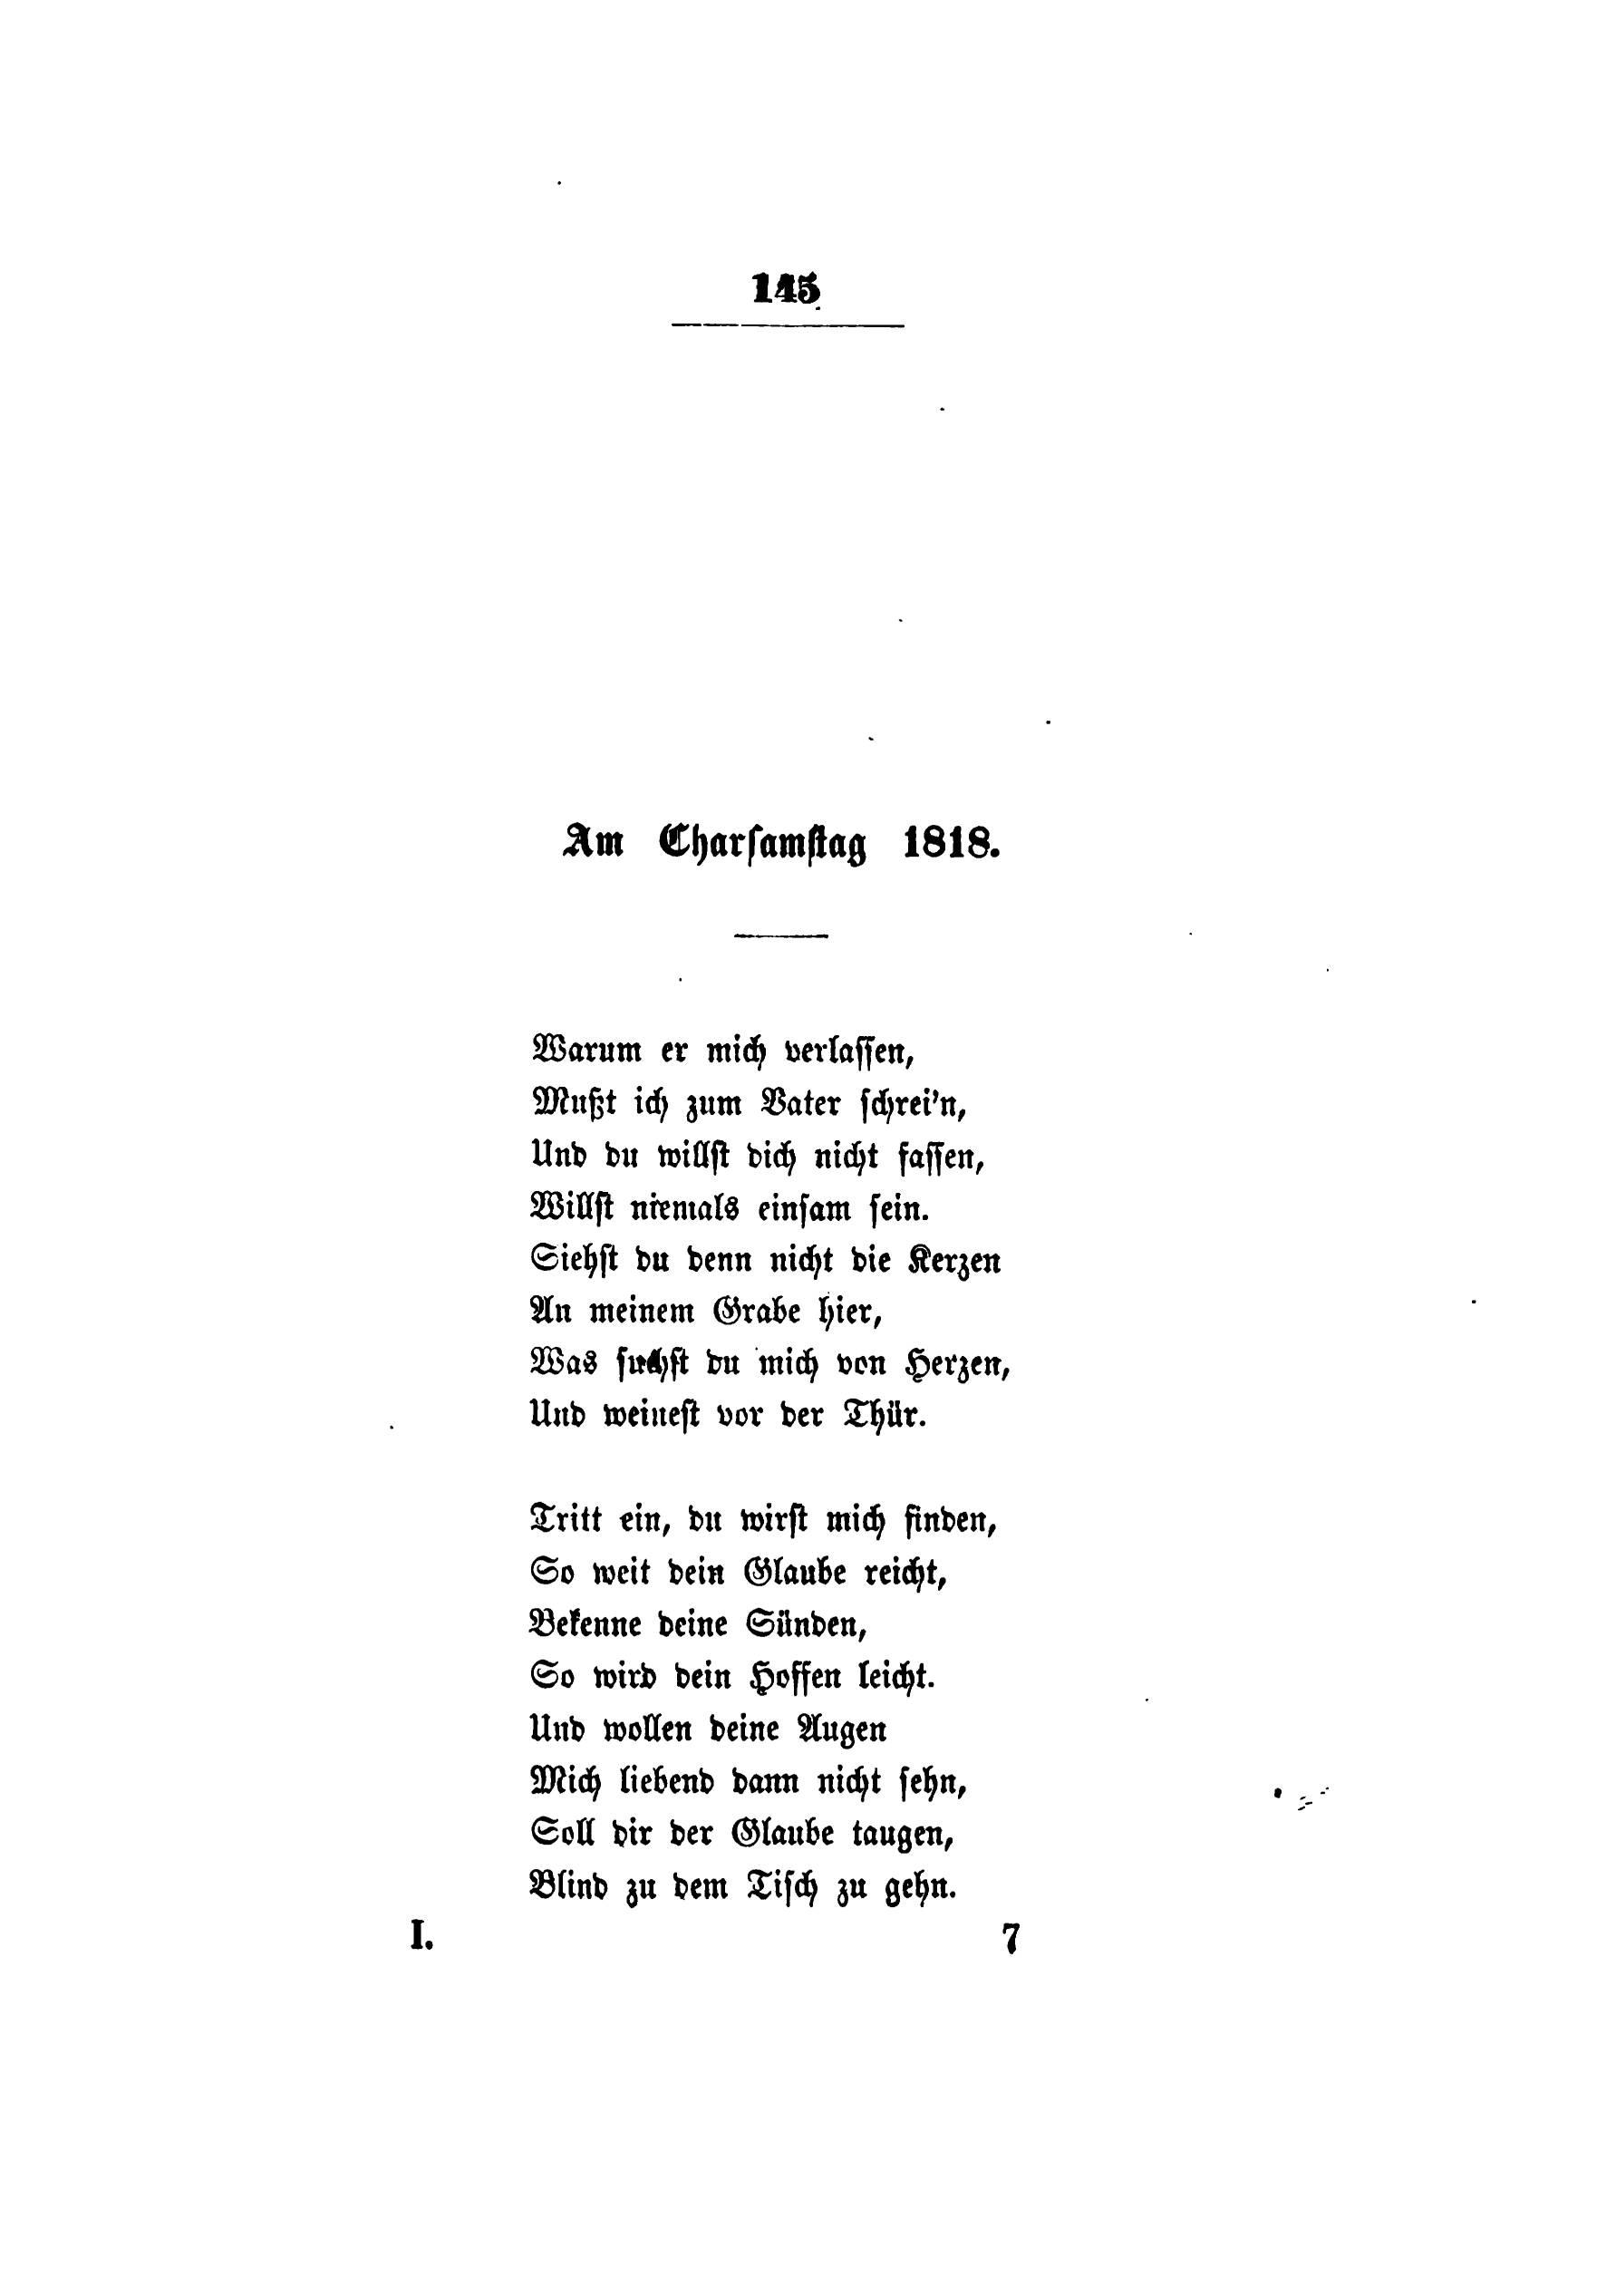 File Clemens Brentano S Gesammelte Schriften I 145 Wikimedia